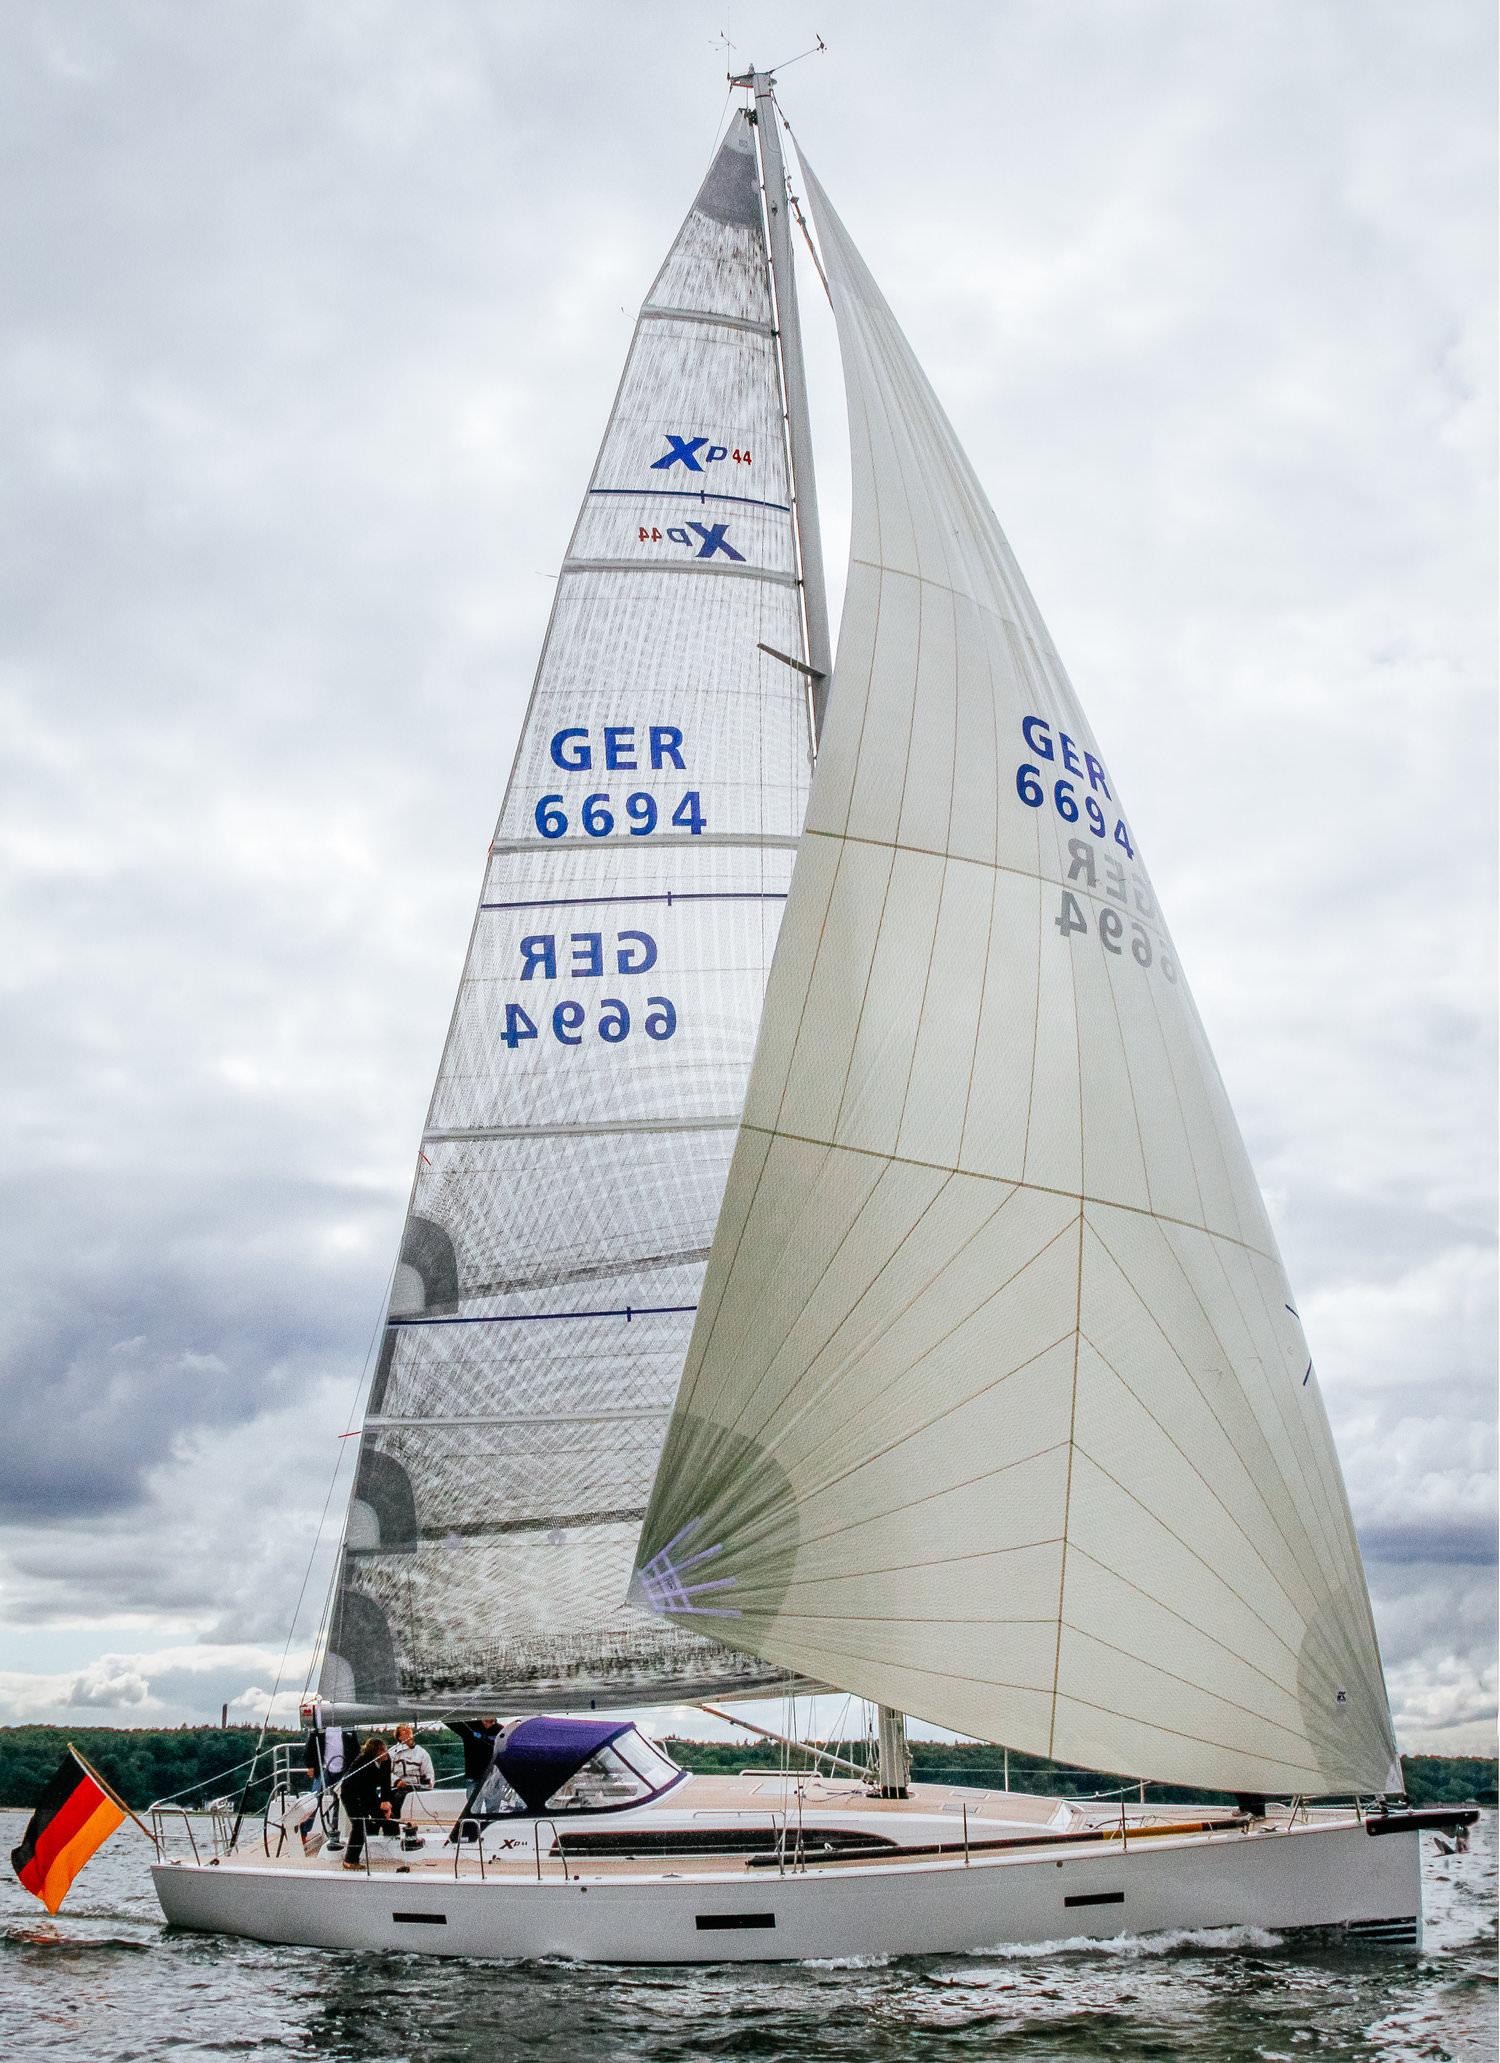 UK+Sailmakers+XP-44+Code+0.jpg